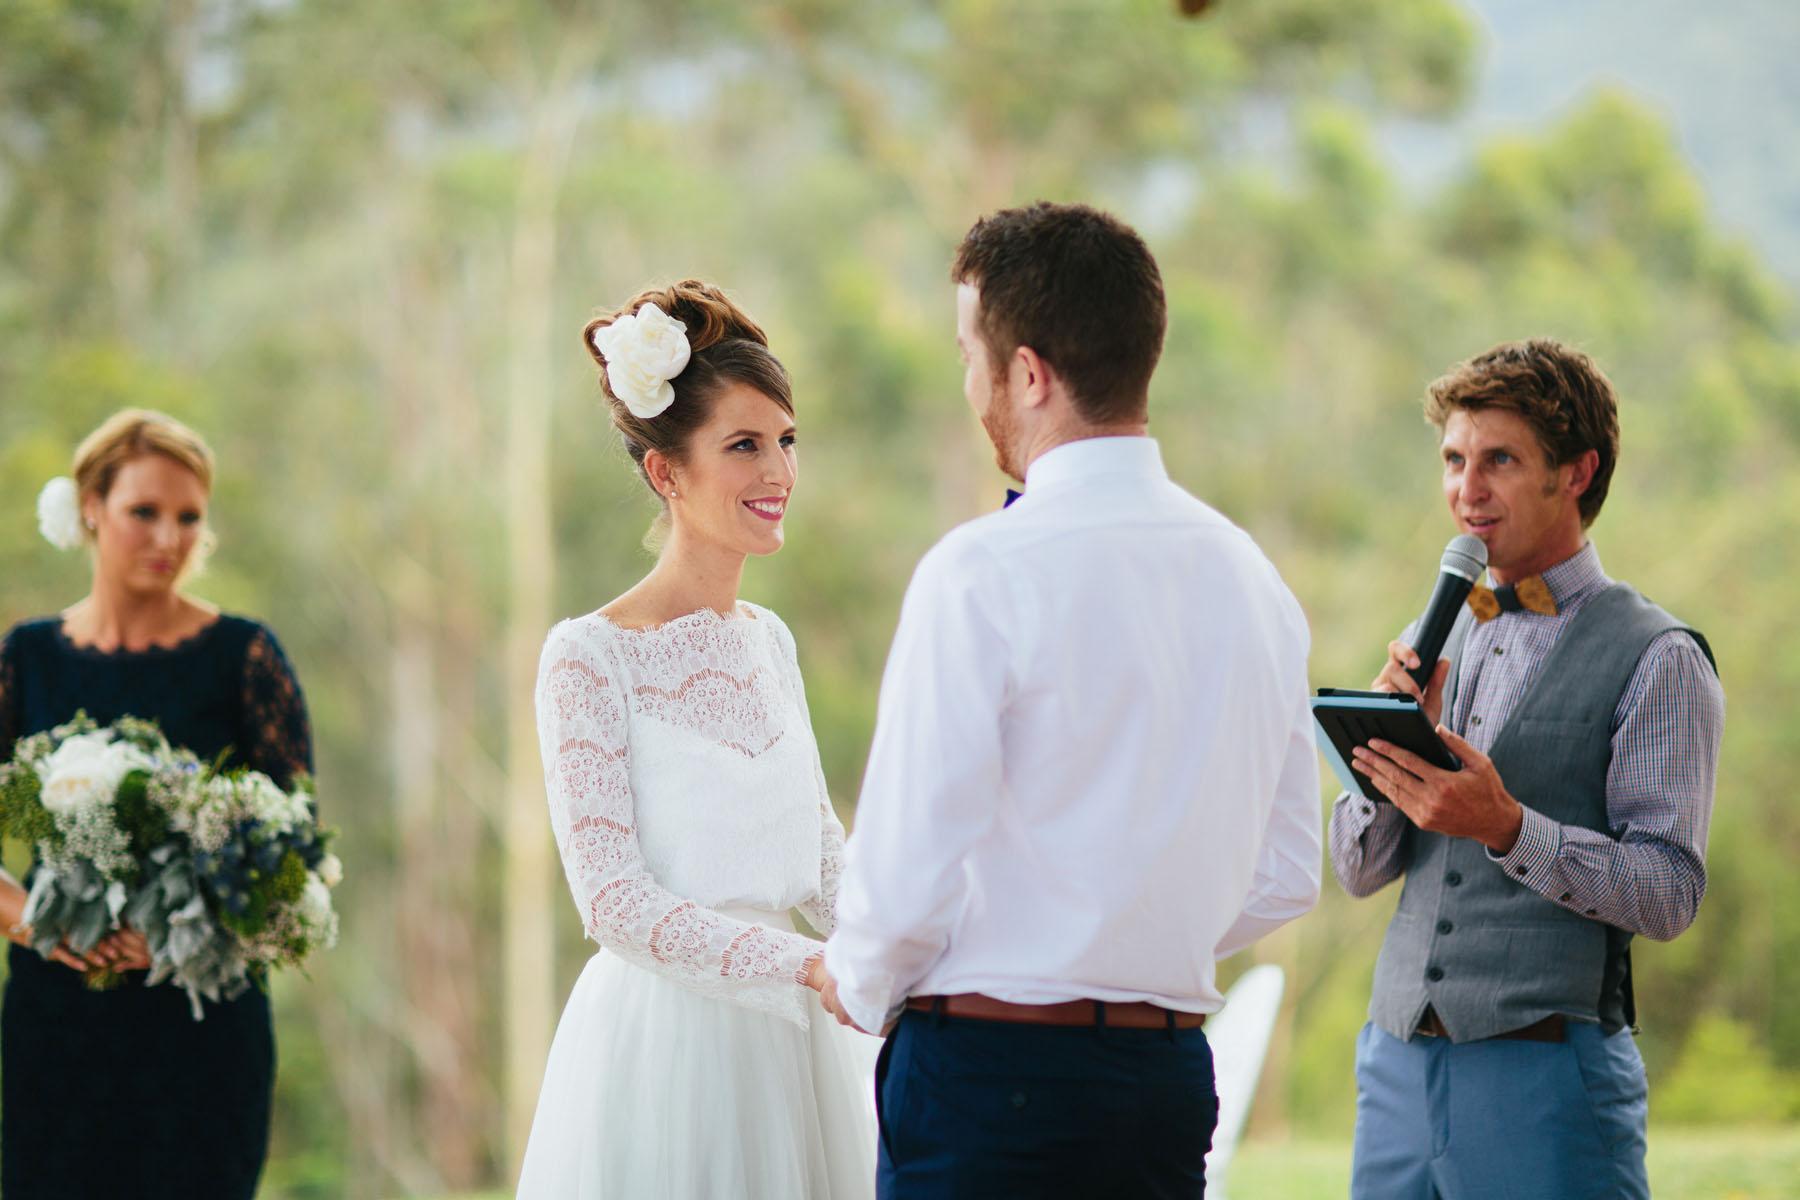 10_midginbill hill wedding .jpg